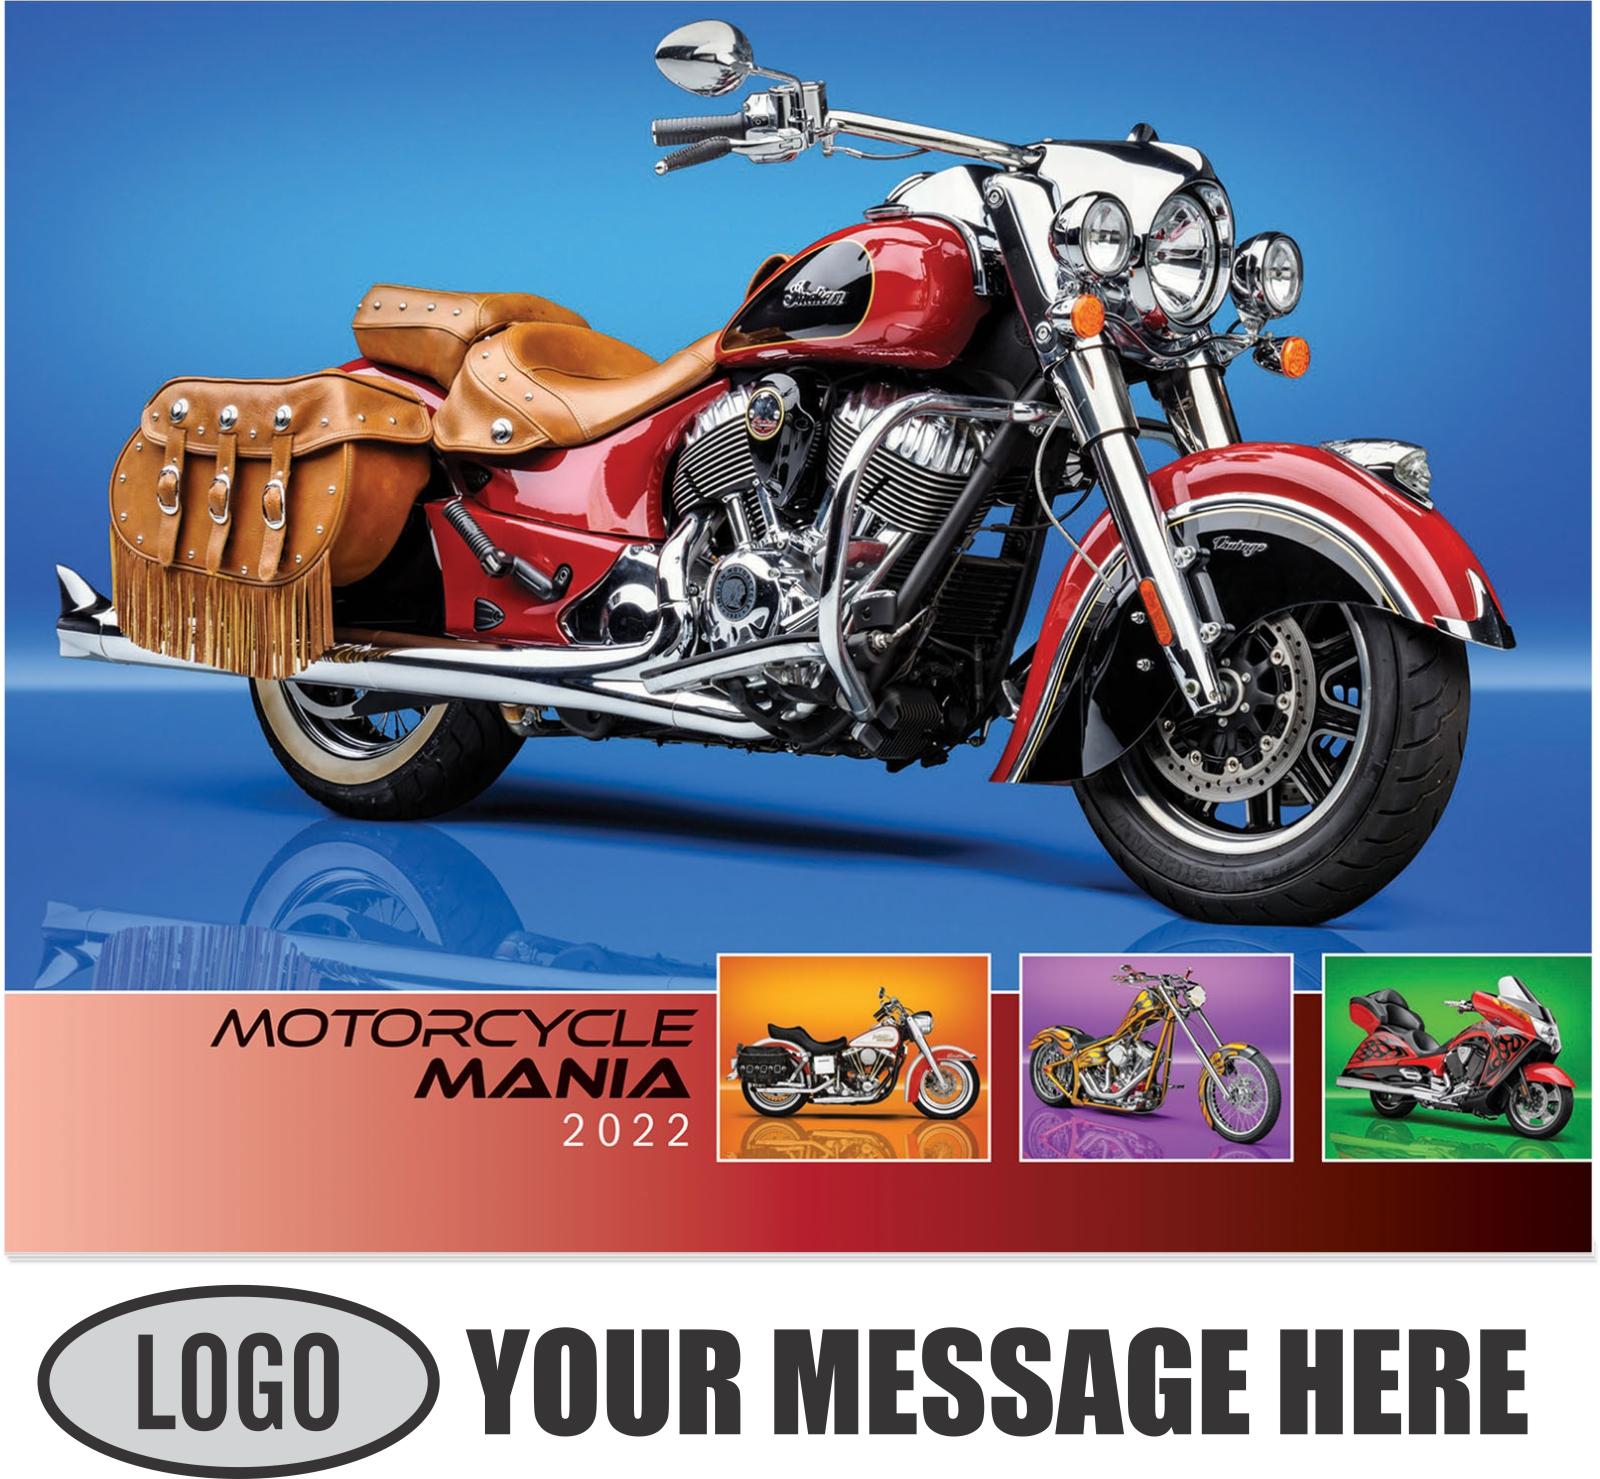 2022 Motorcycle Mania Promotional Calendar